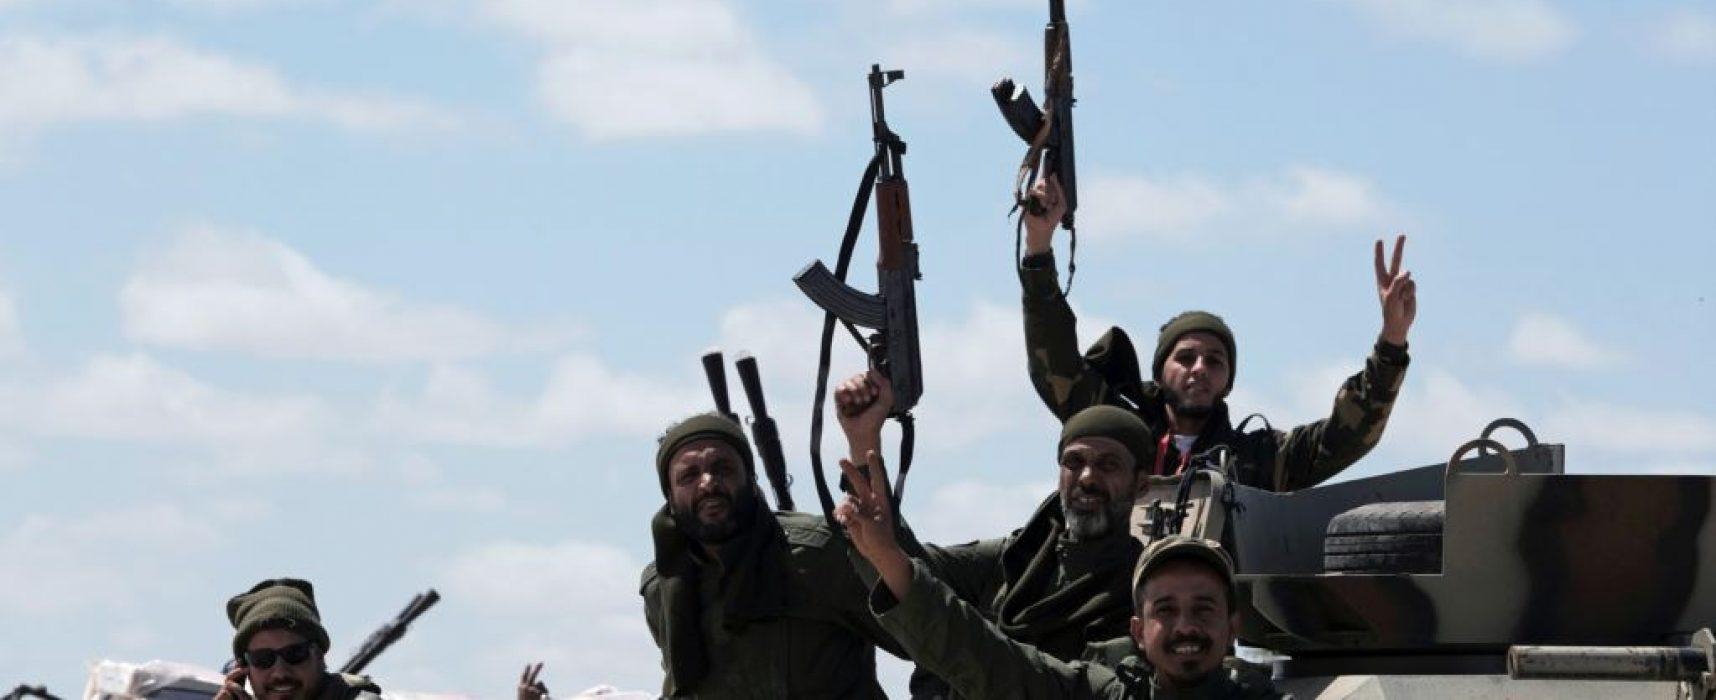 Did NATO cause the crisis in Libya?